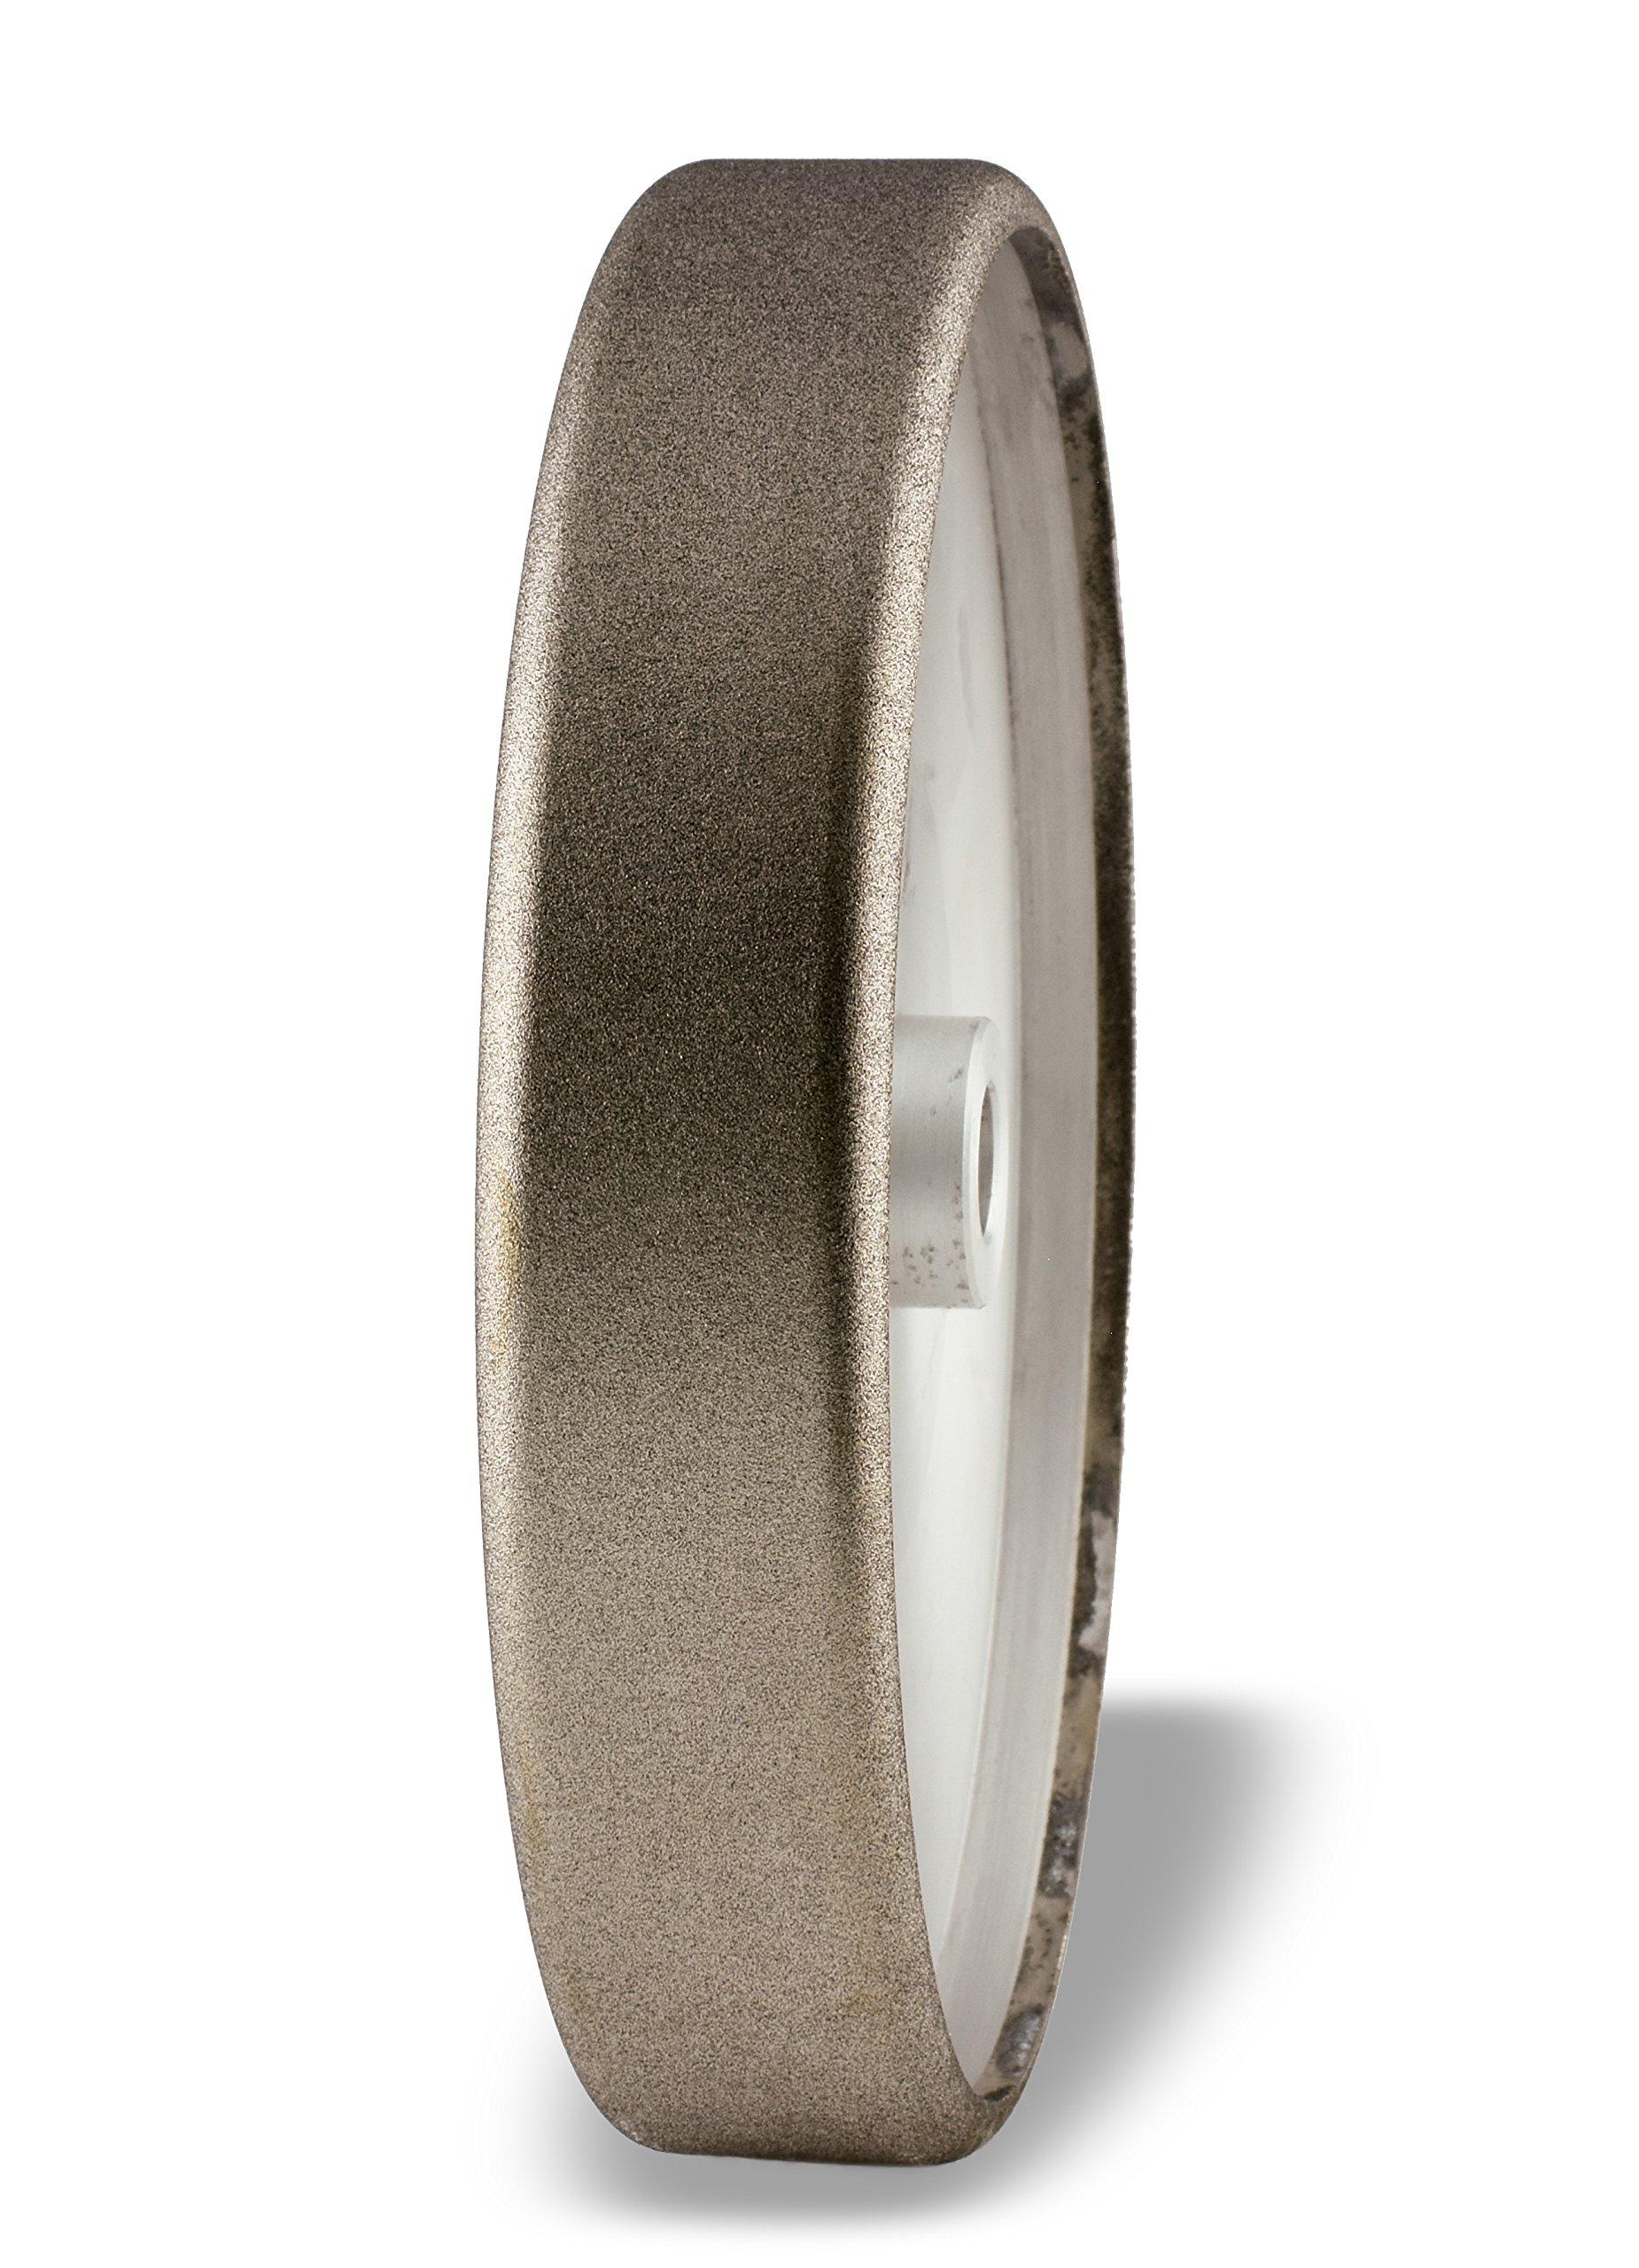 CBN Wheel 8 inch, 5/8'' Arbor, 180 grit